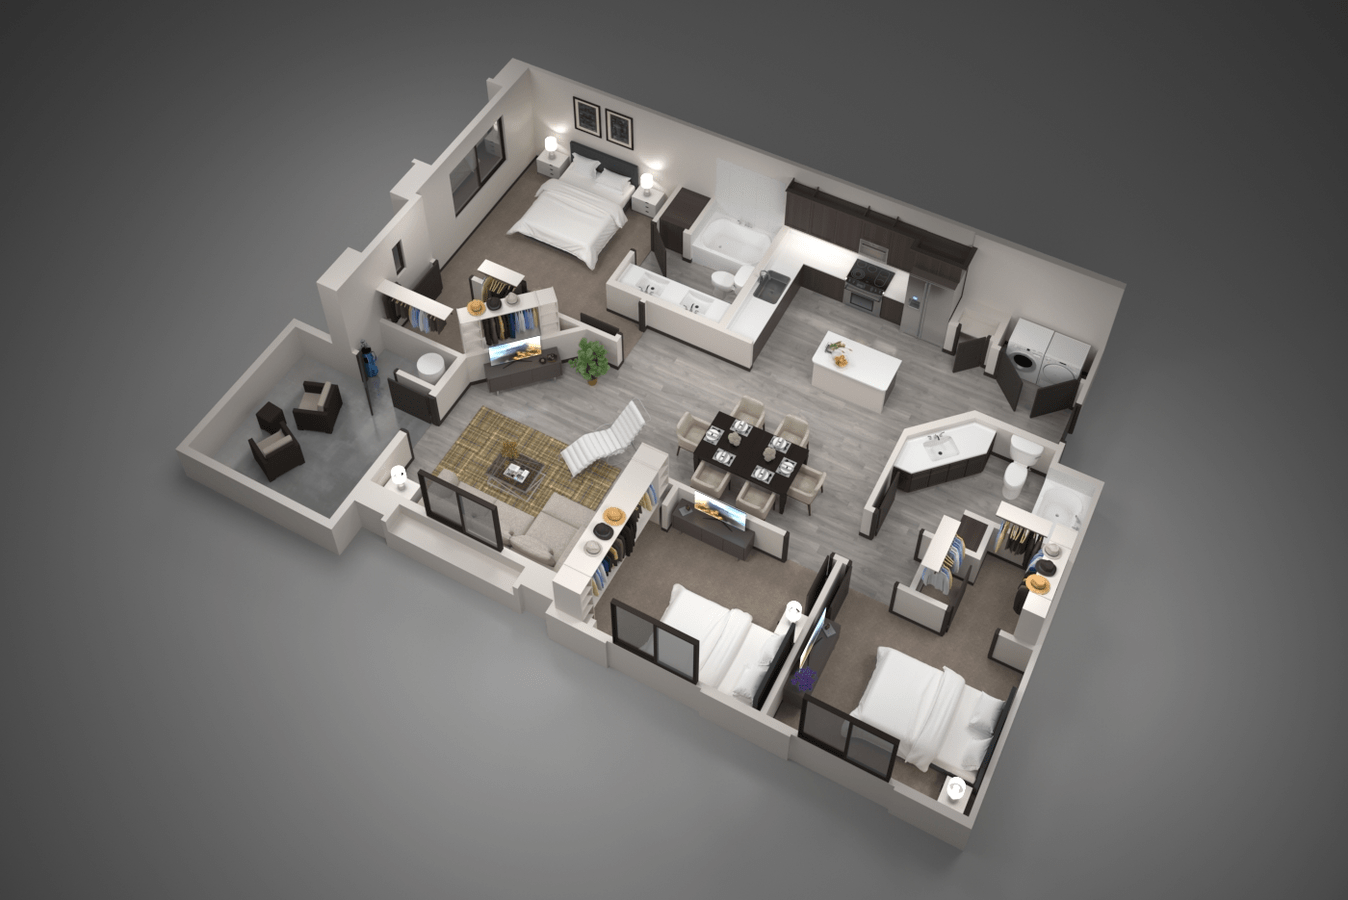 3 Bedrooms 2 Bathrooms Apartment for rent at Aviva in Mesa, AZ